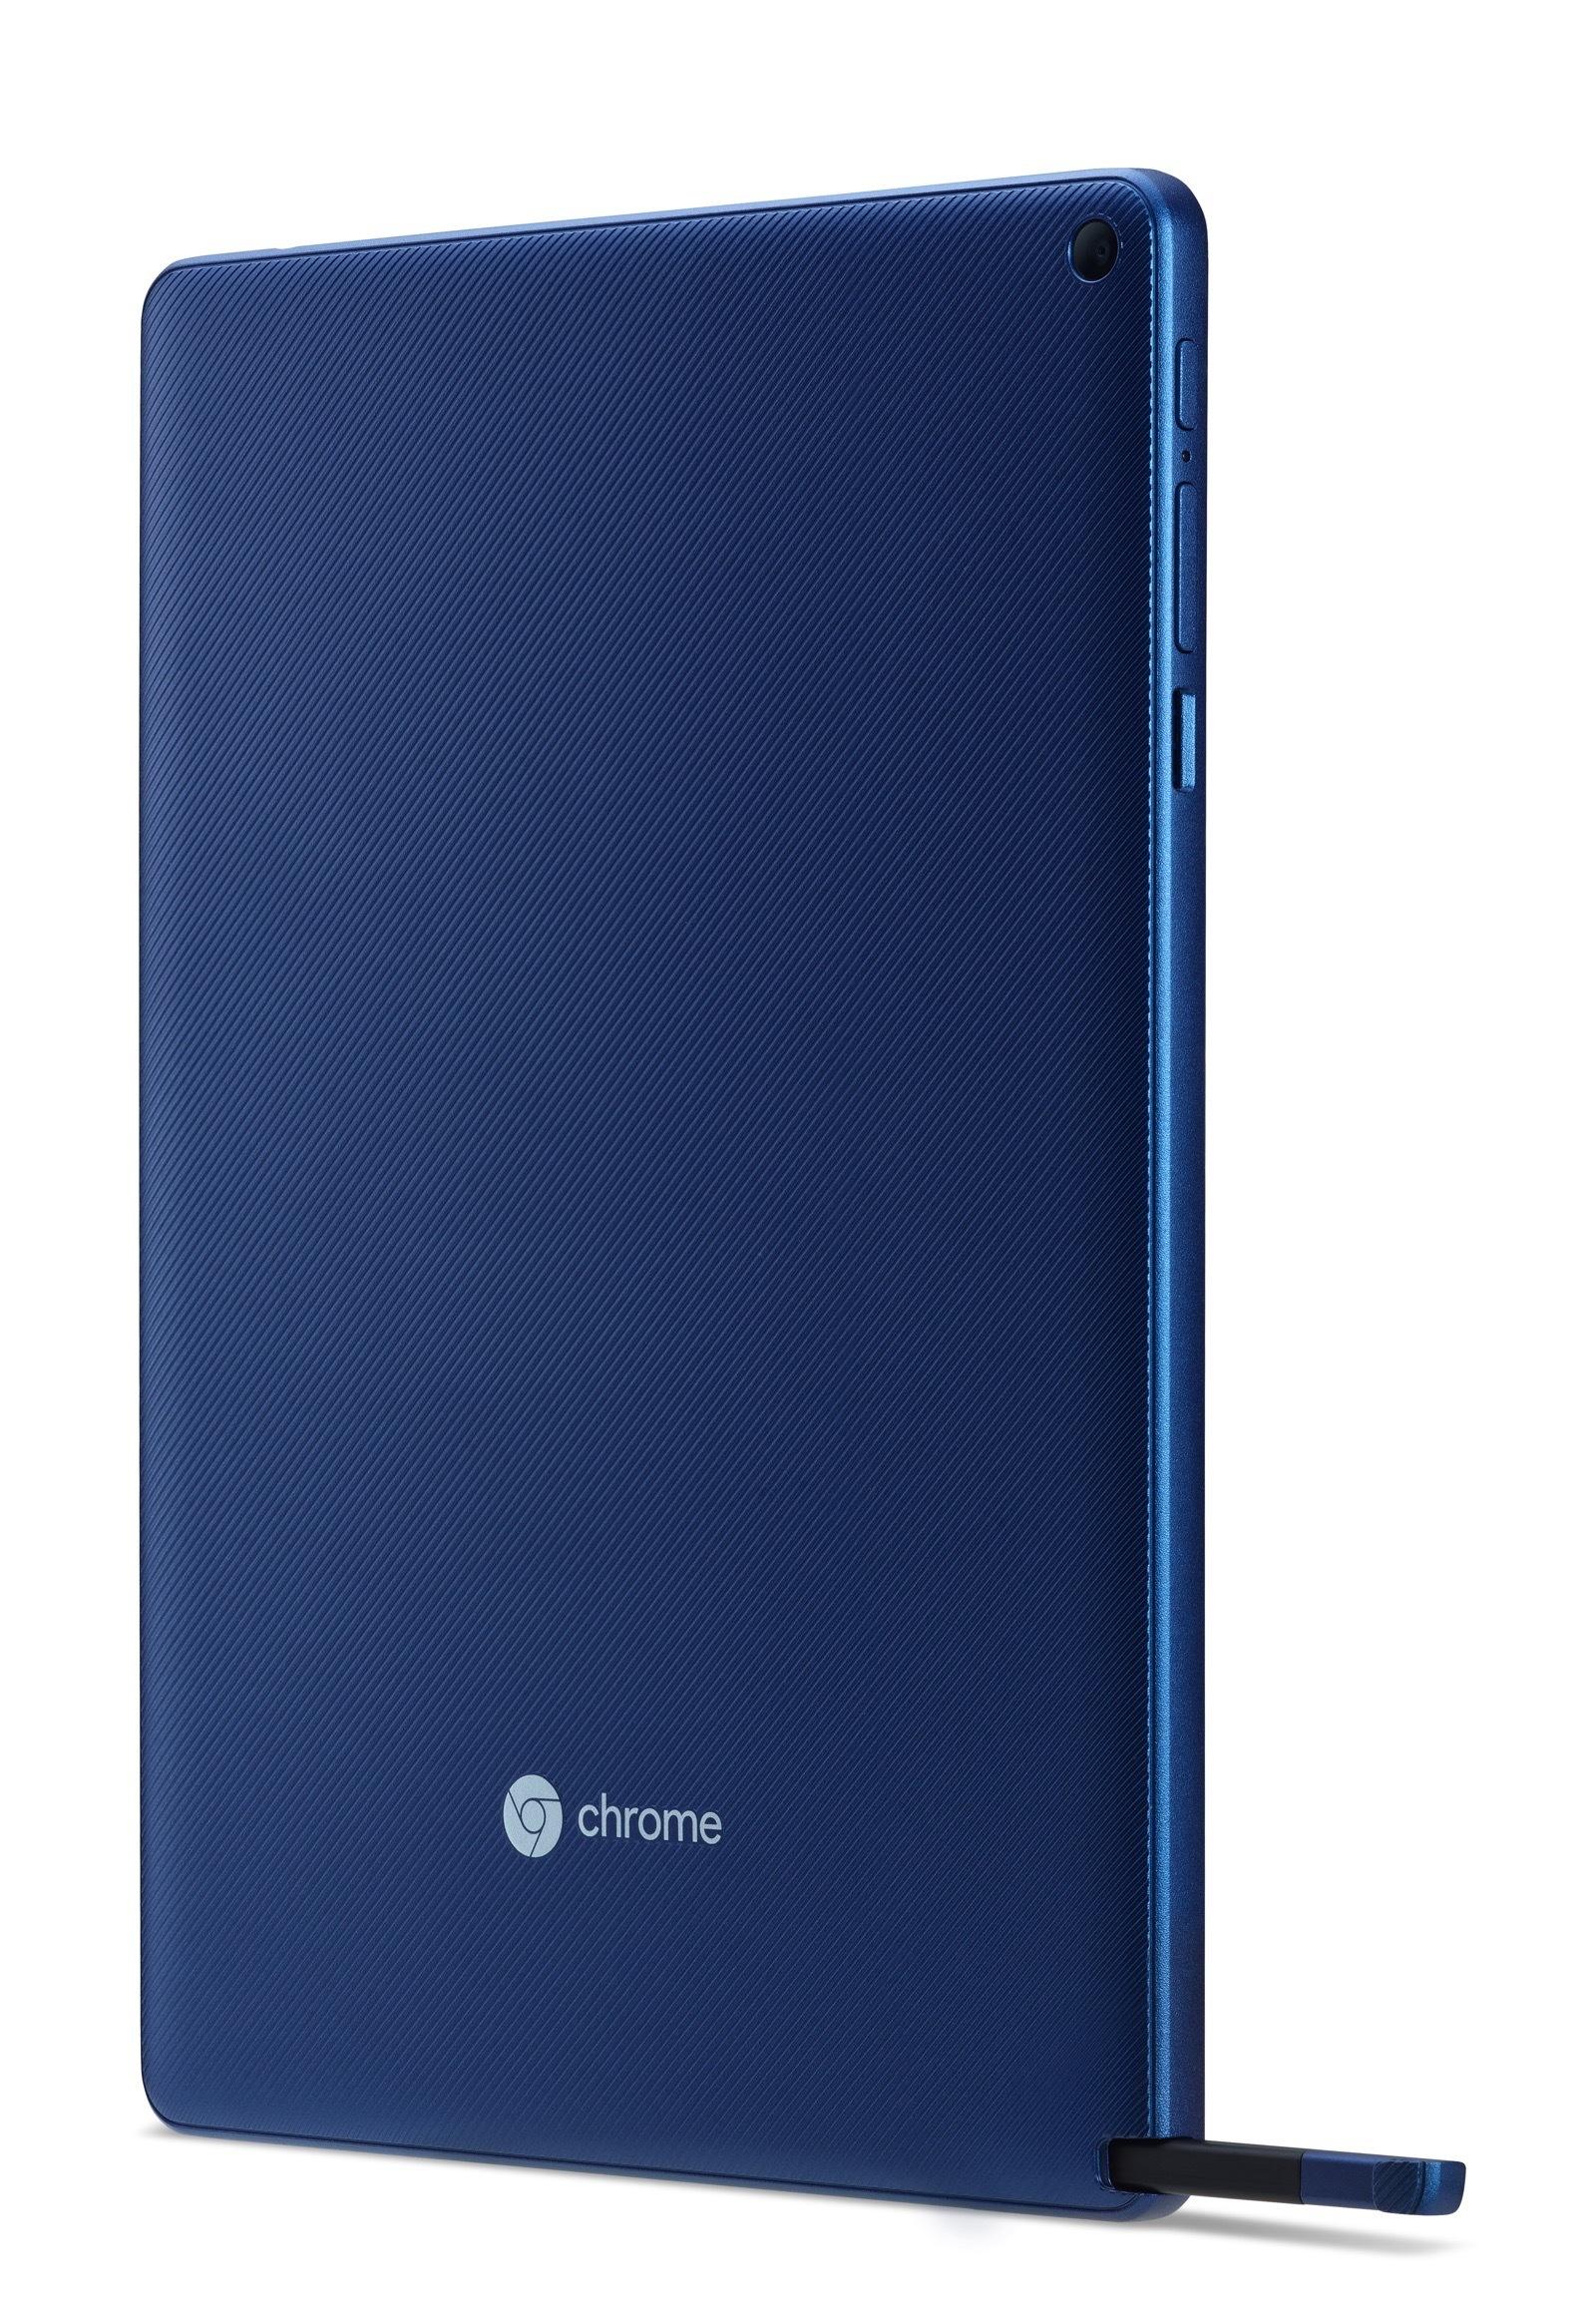 Chromebook Tab 10, tablet da Acer rodando Chrome OS